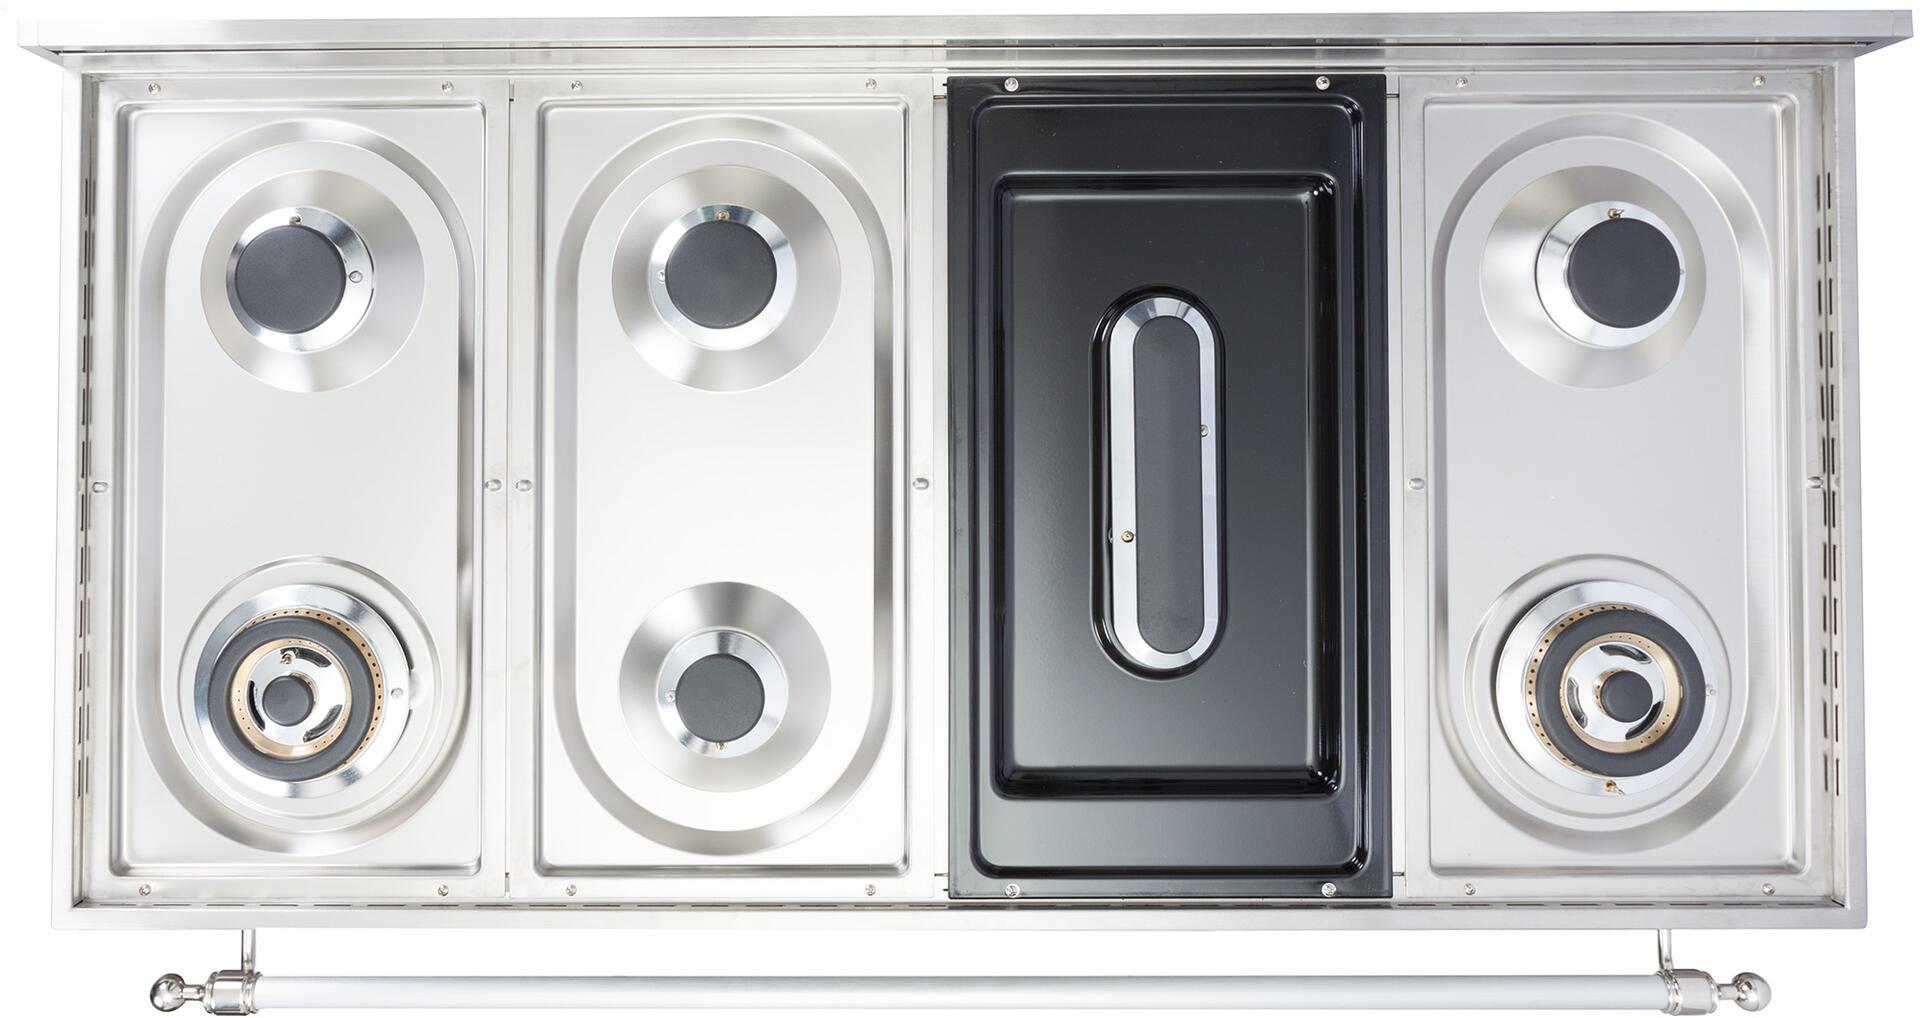 Ilve Nostalgie UPN120FDMPAY Freestanding Dual Fuel Range Bisque, Cooktop without Grates